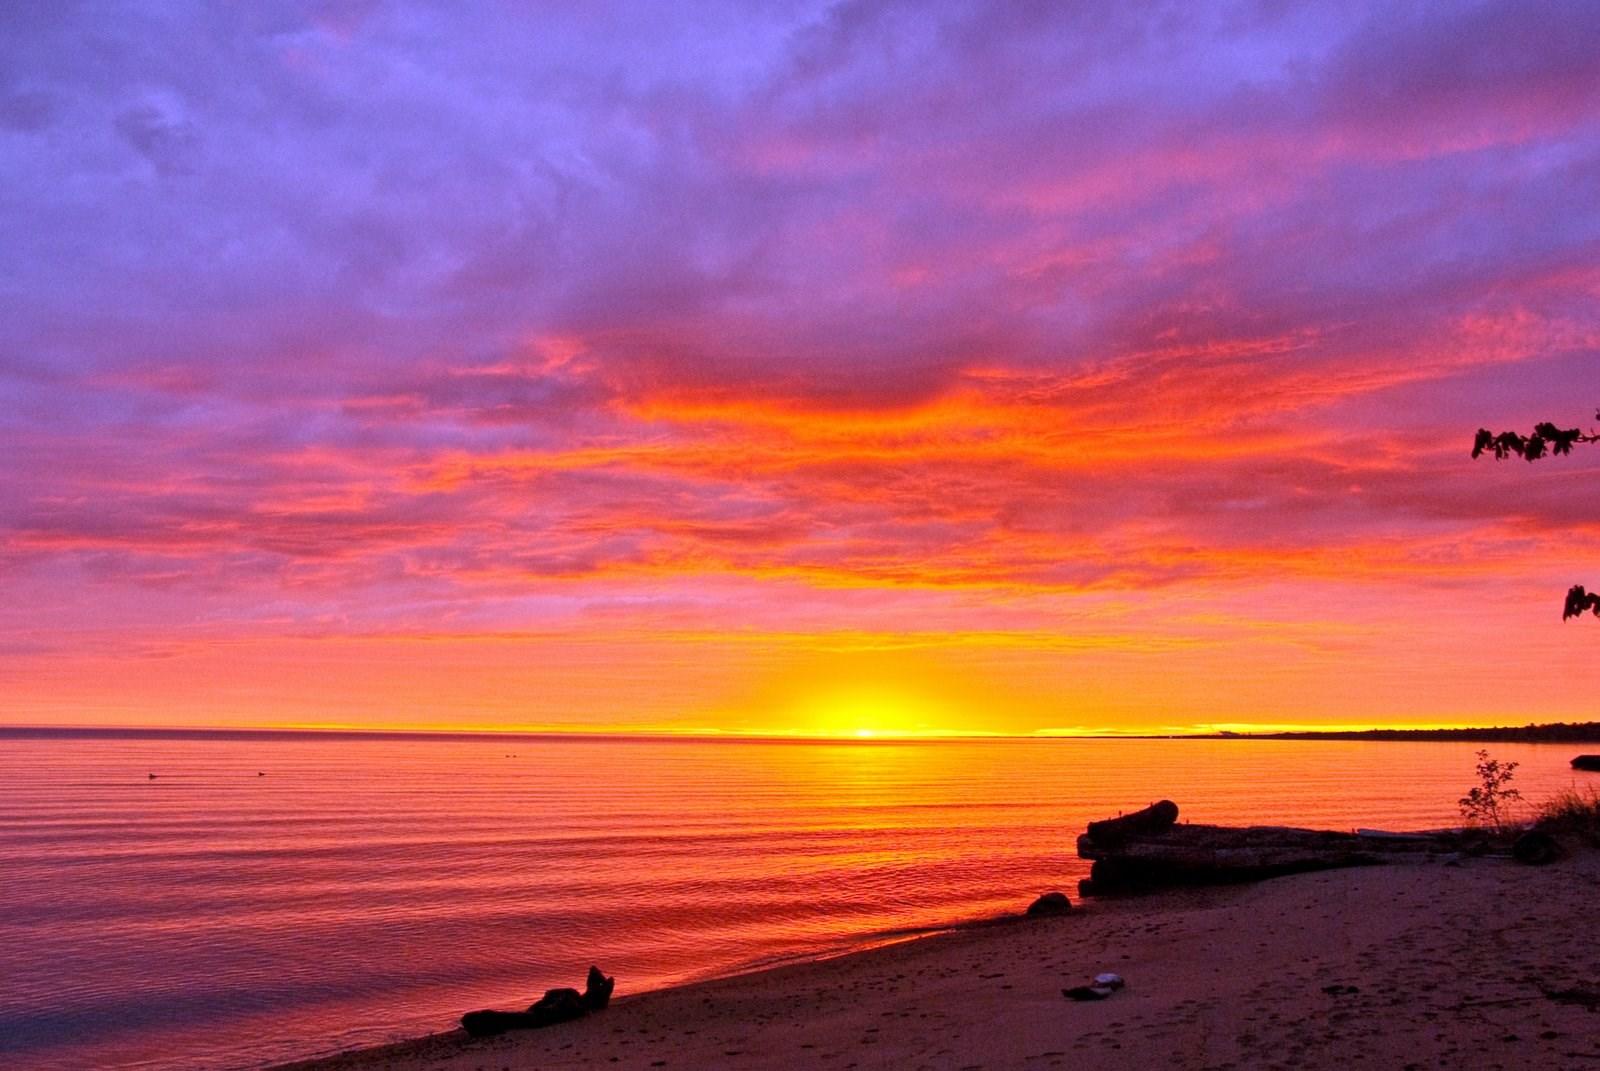 sunrise pictures captions - HD1600×1071